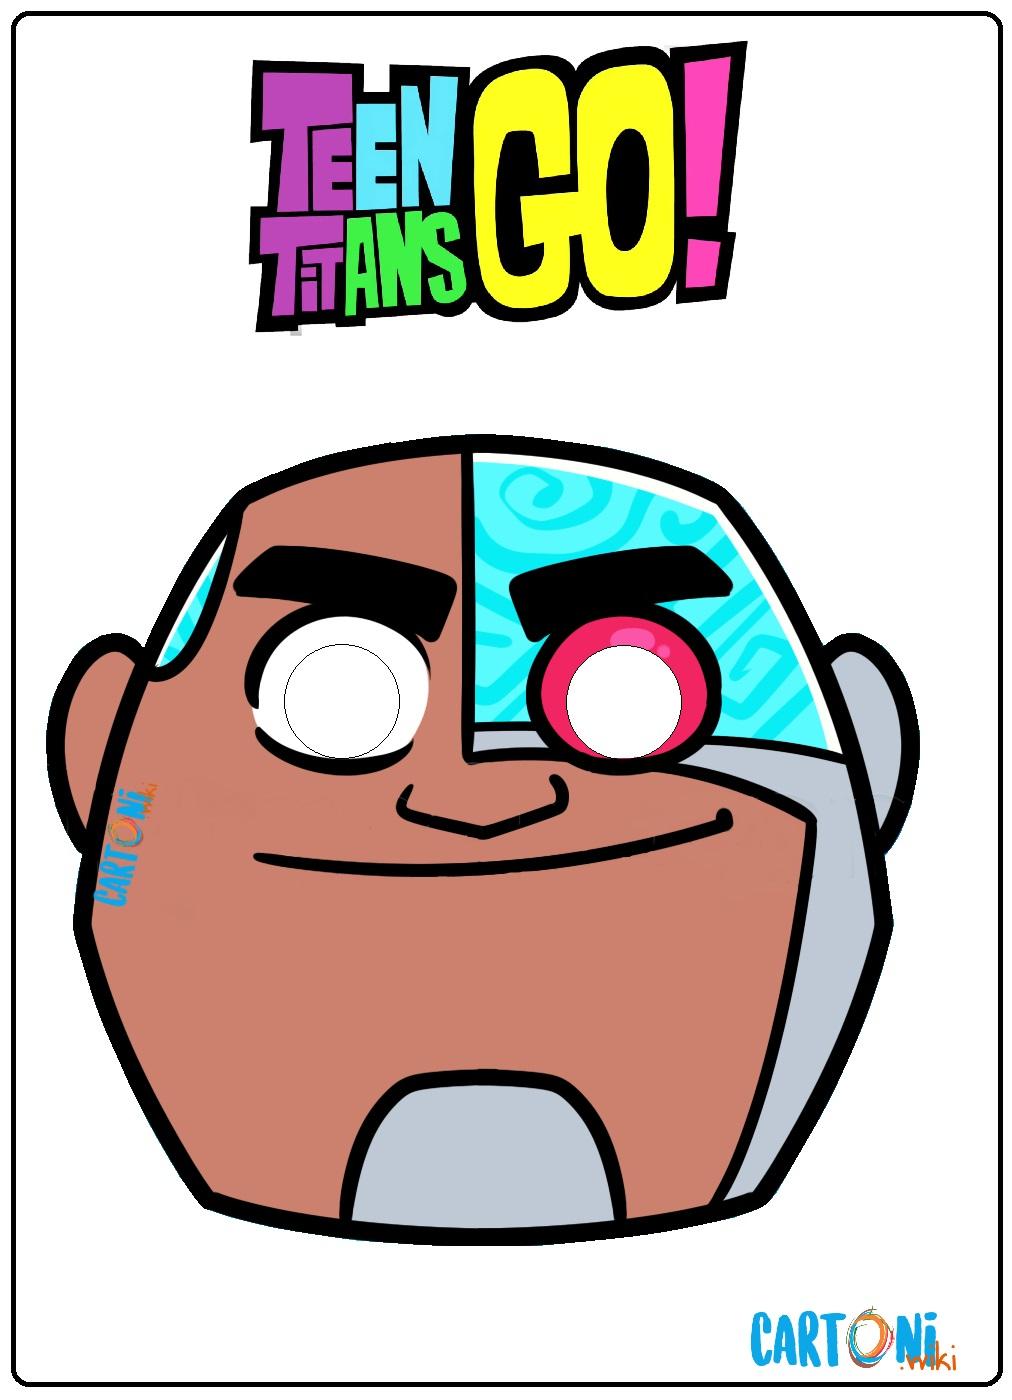 Teen titans Go maschera Cyborg - Cartoni animati